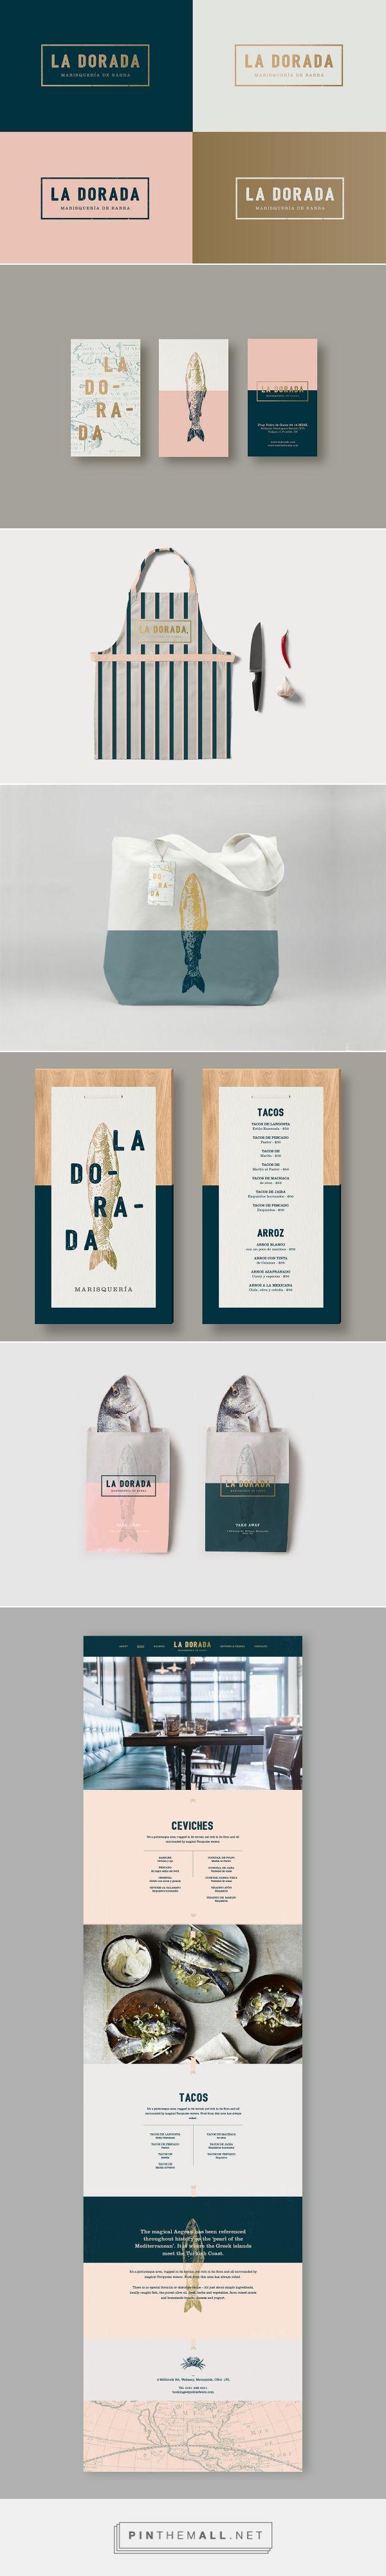 La Dorada packaging branding on Behance curated